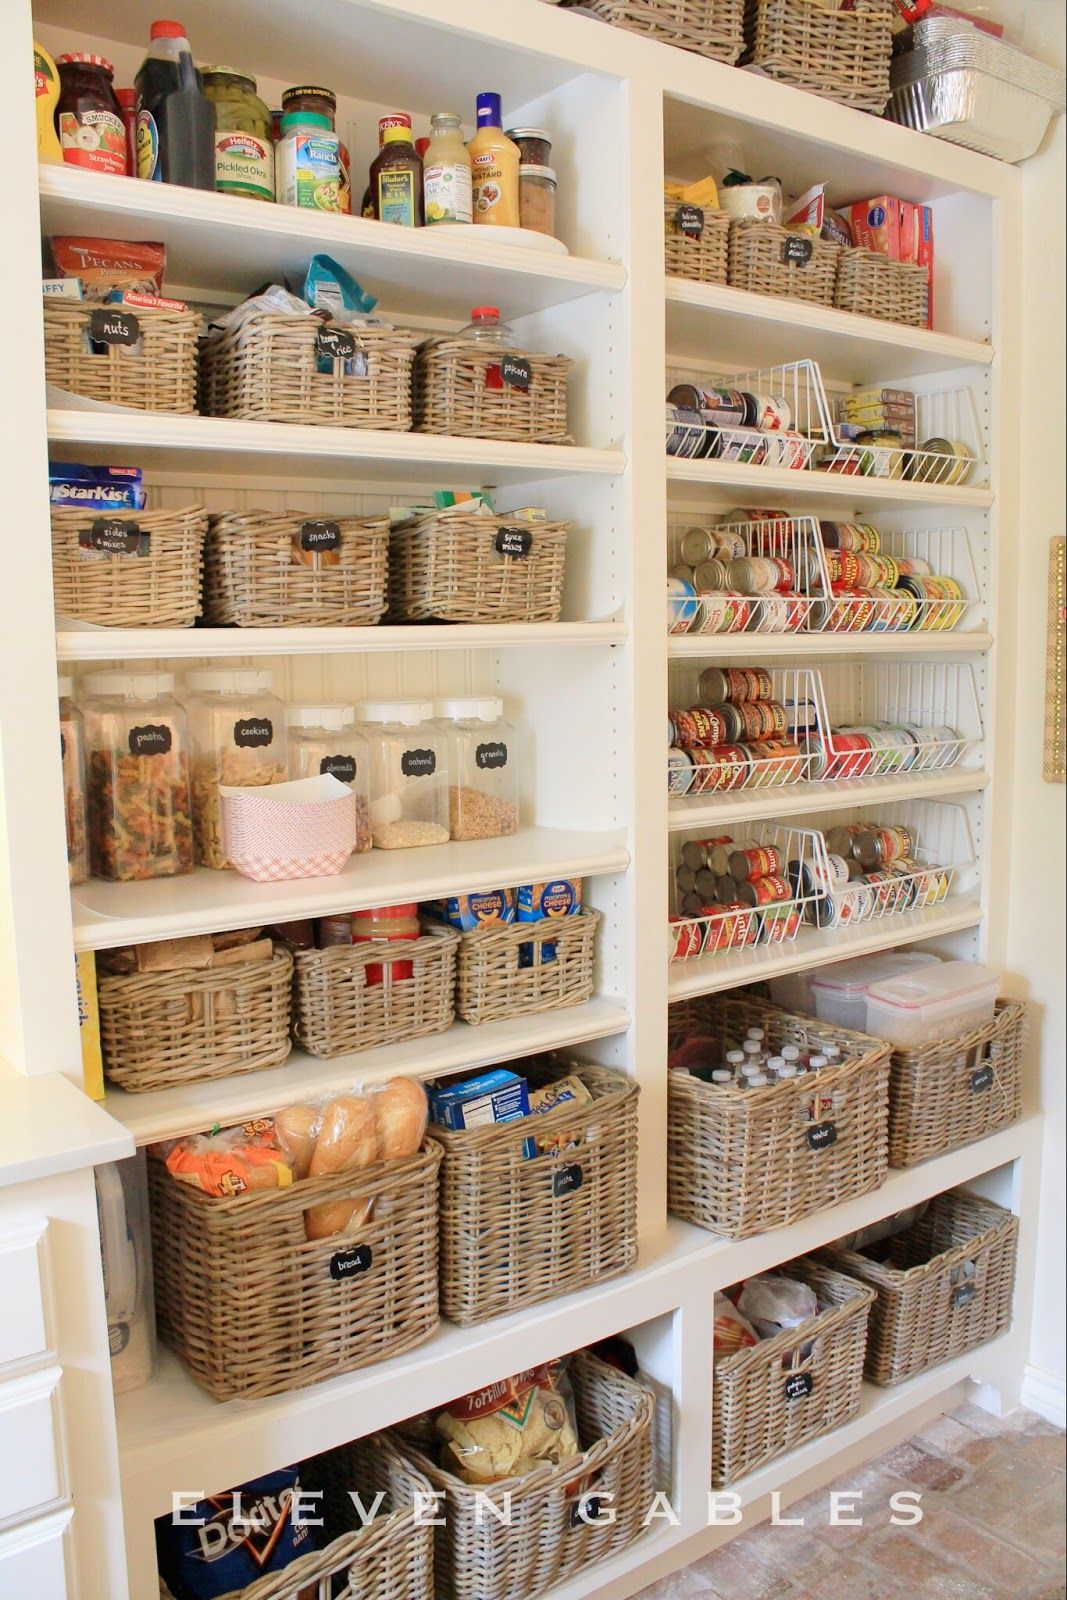 Pin de MaryJane Moore en Cleaning/Organization/Storage | Pinterest ...